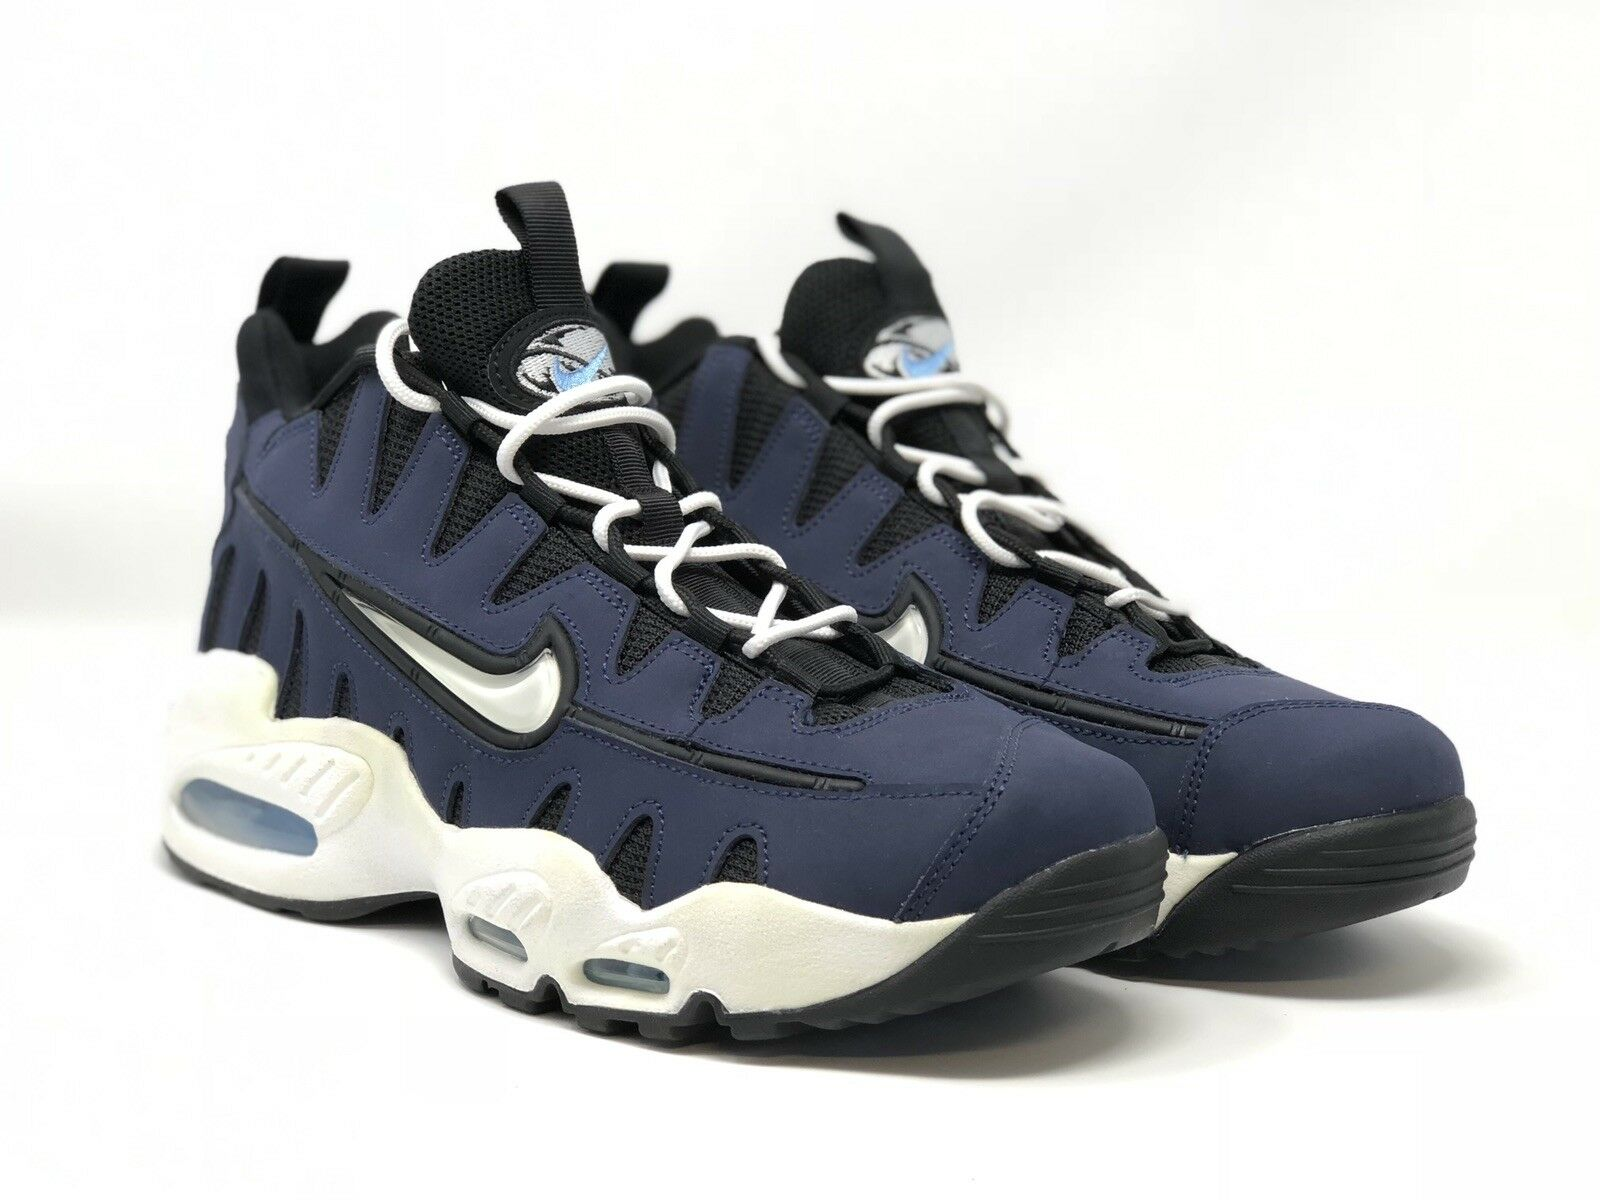 Nike air max nm hideo Uomo no Uomo hideo scarpe metà marina bianchi sz 10,5 nuovi 429749 402 c4c0e4